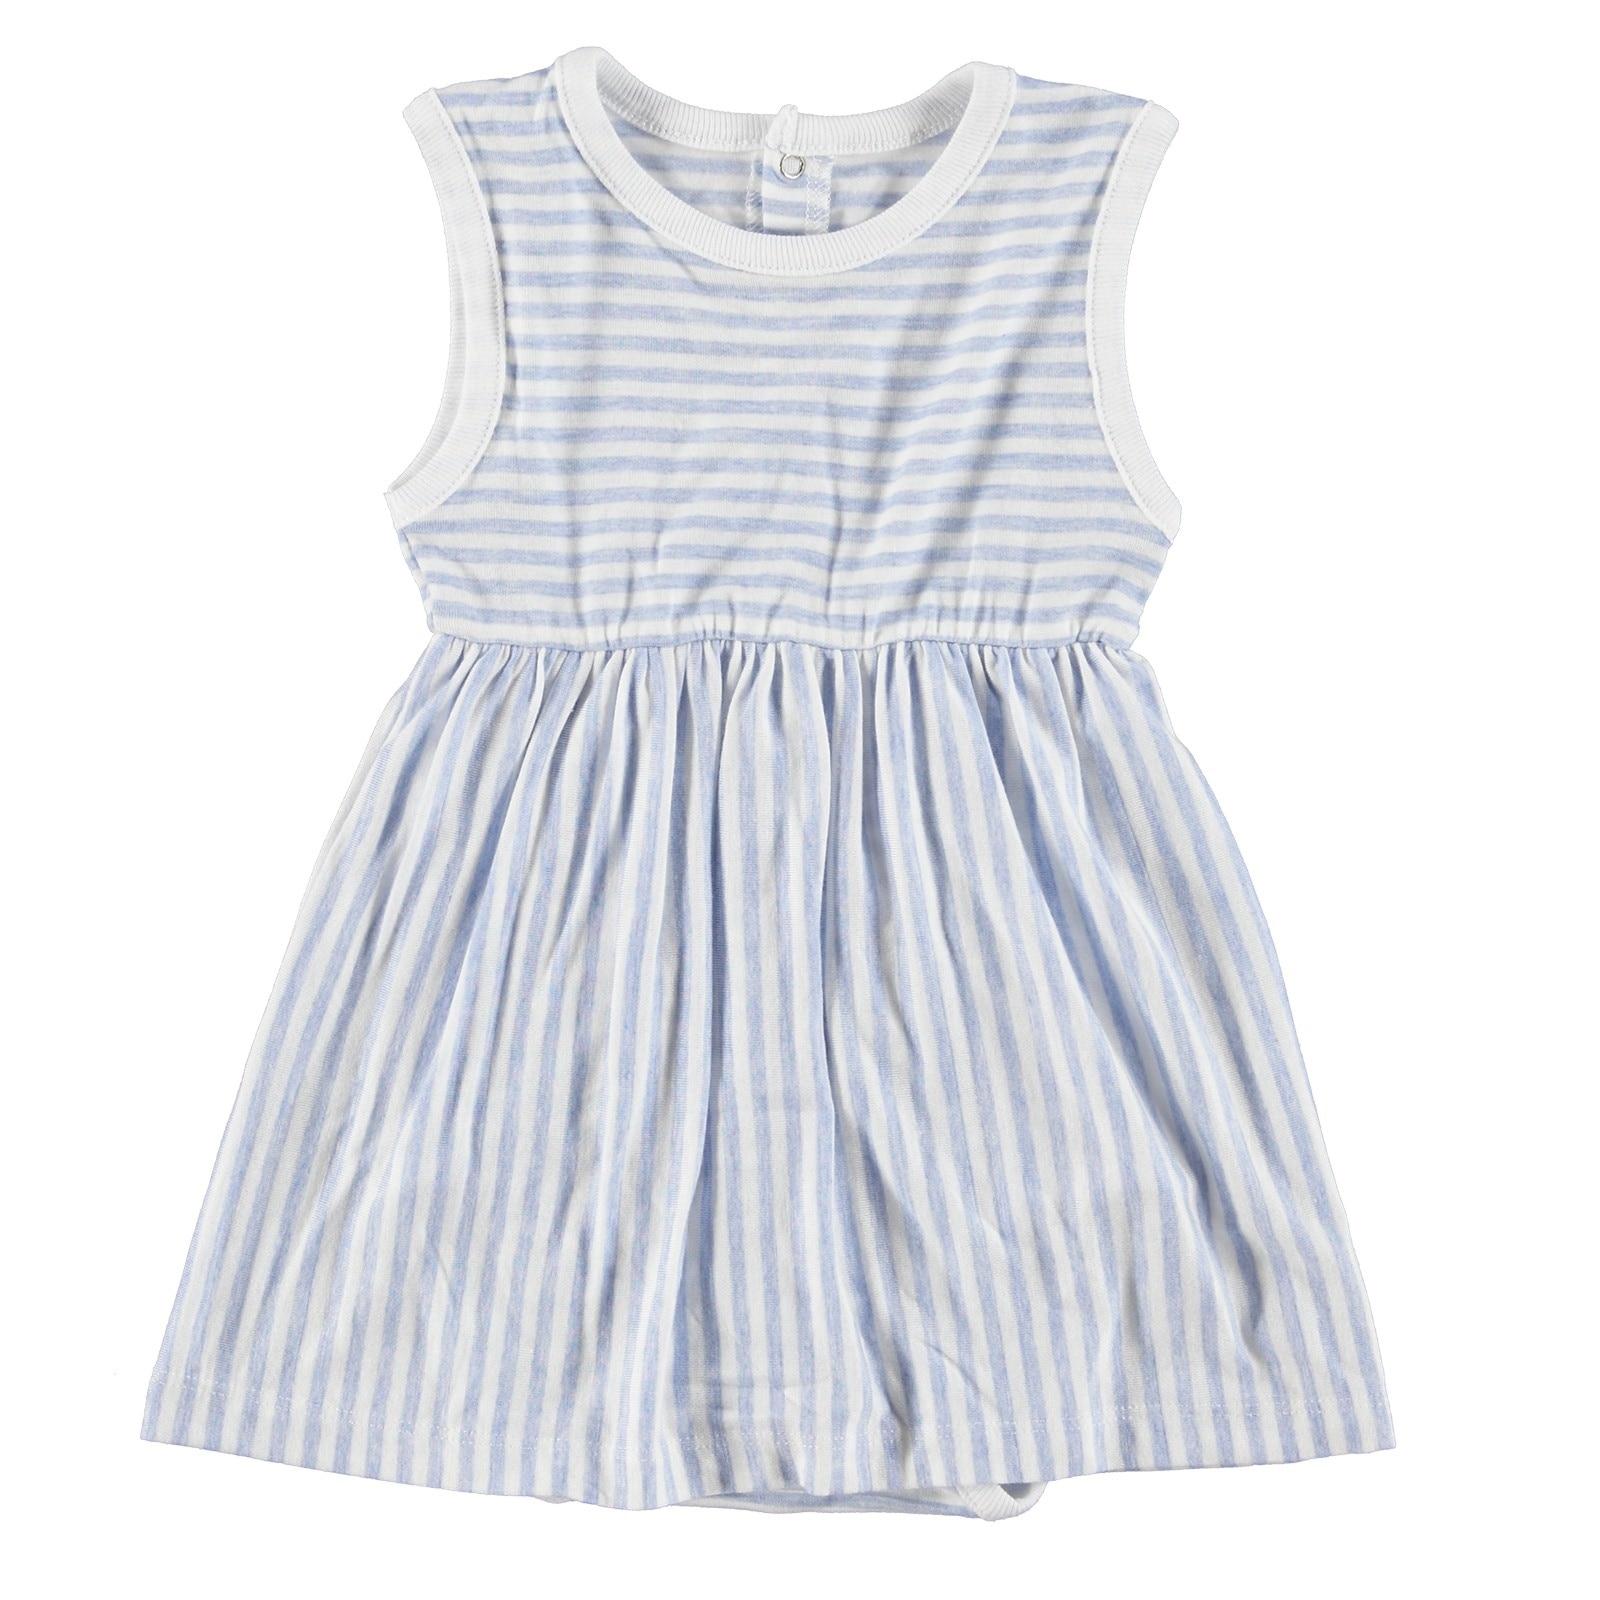 Ebebek Newborn Fashion Club Baby Girl Dress Bodysuit